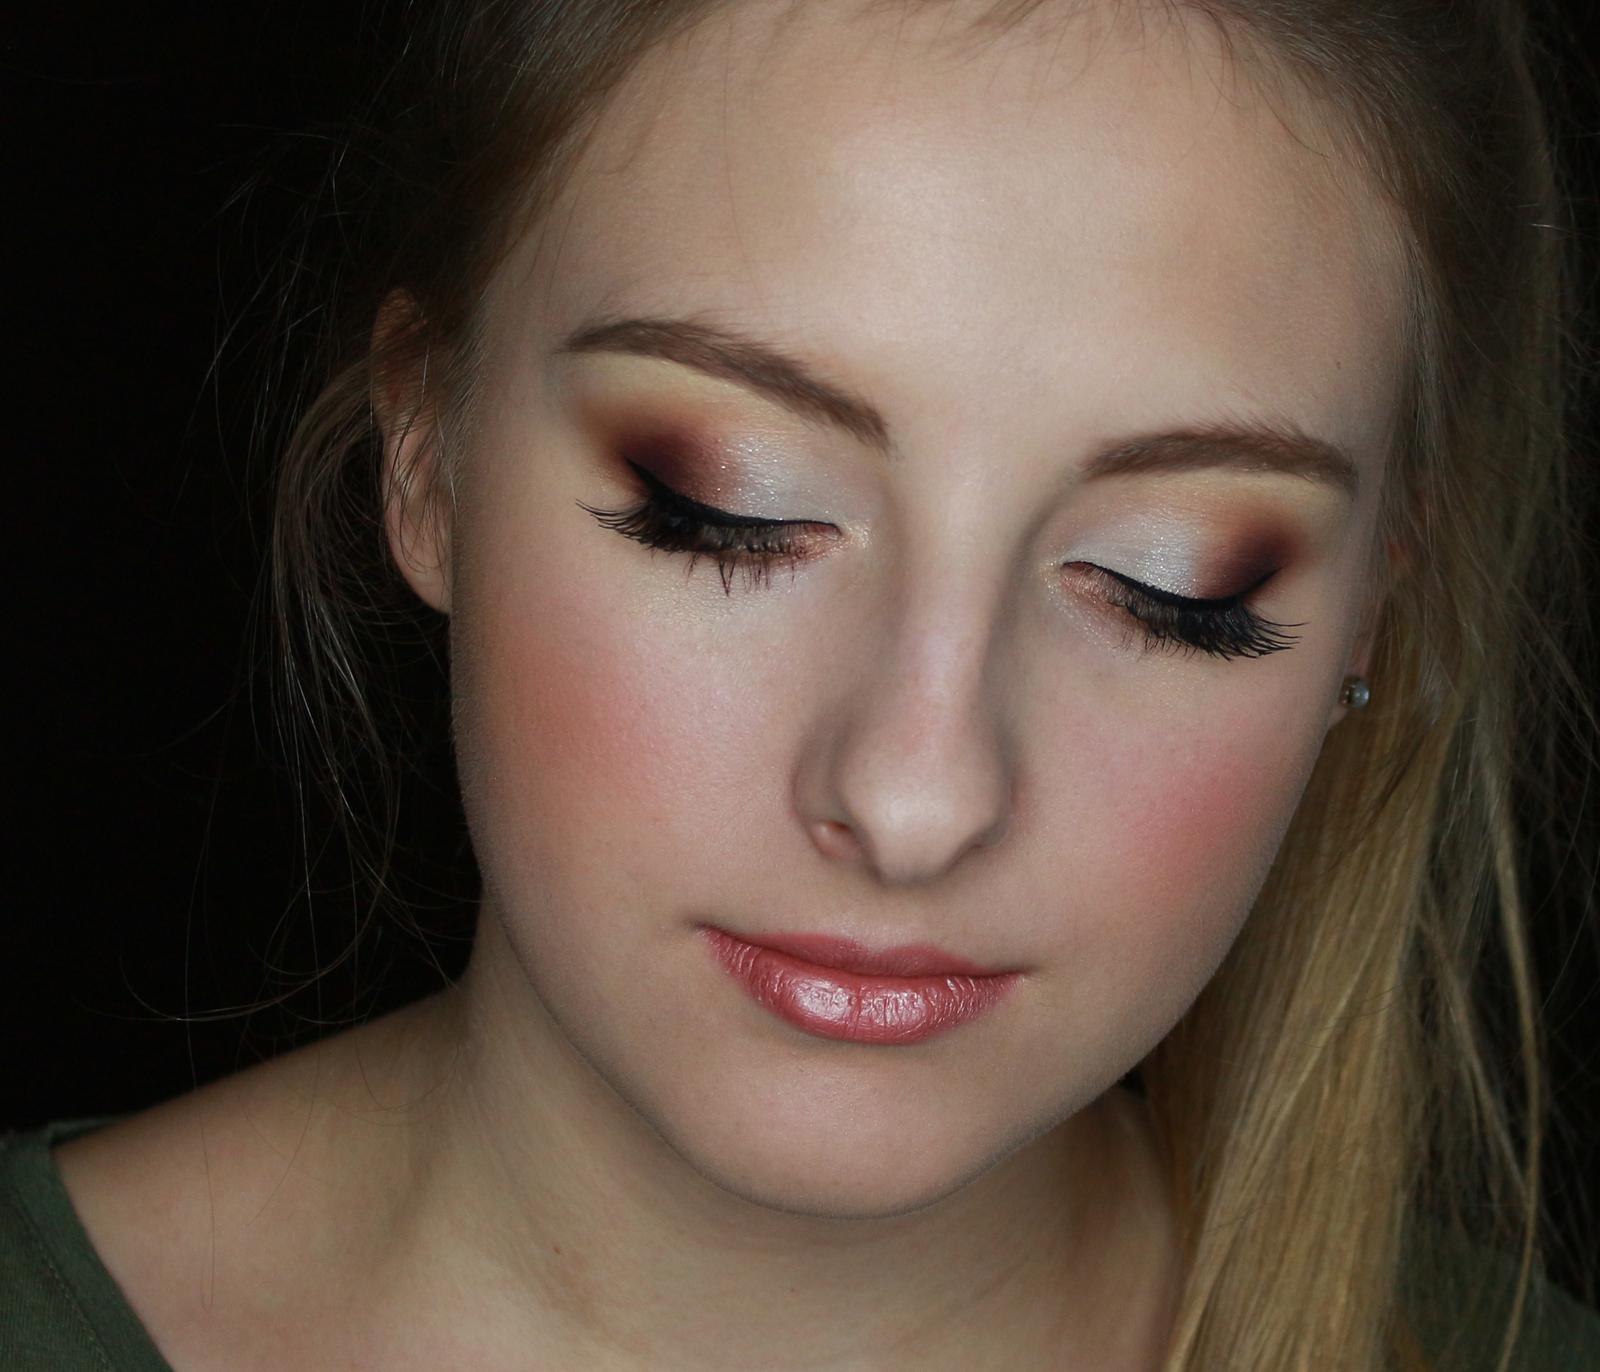 Vizážistka Žilina, svadobný makeup - jemné romantické matné líčenie očí